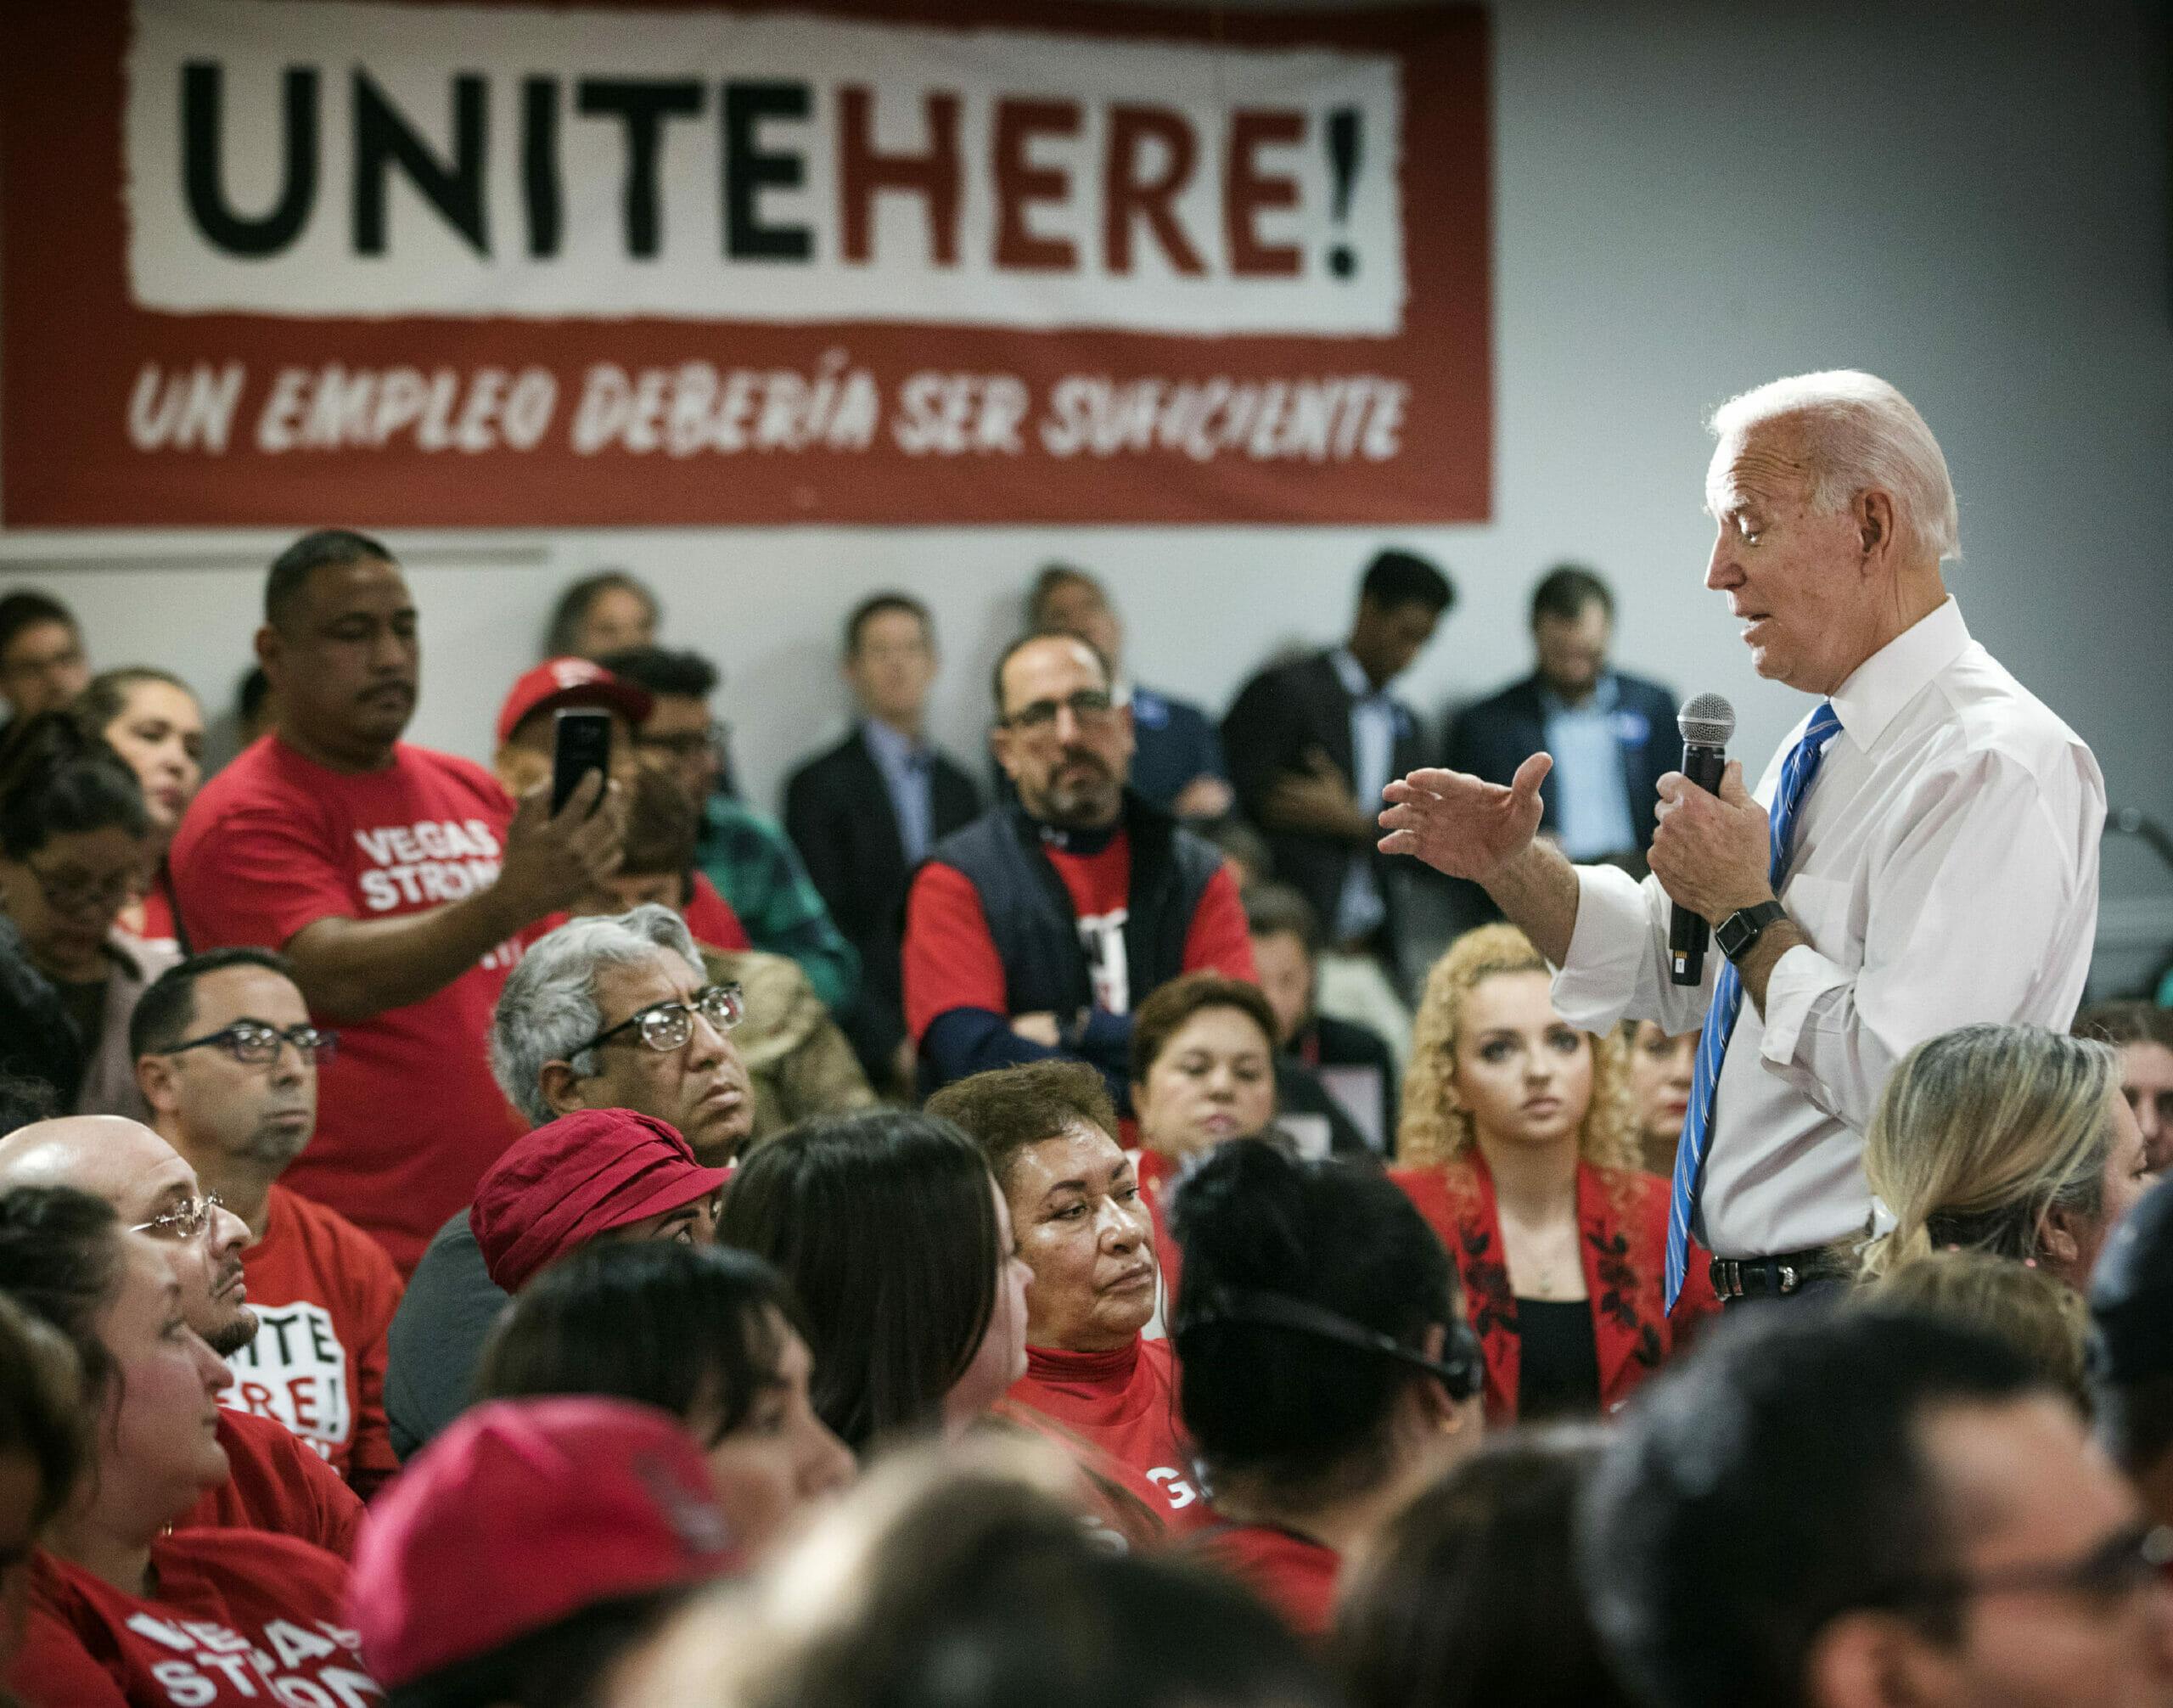 Joe Biden speaking to a crowd